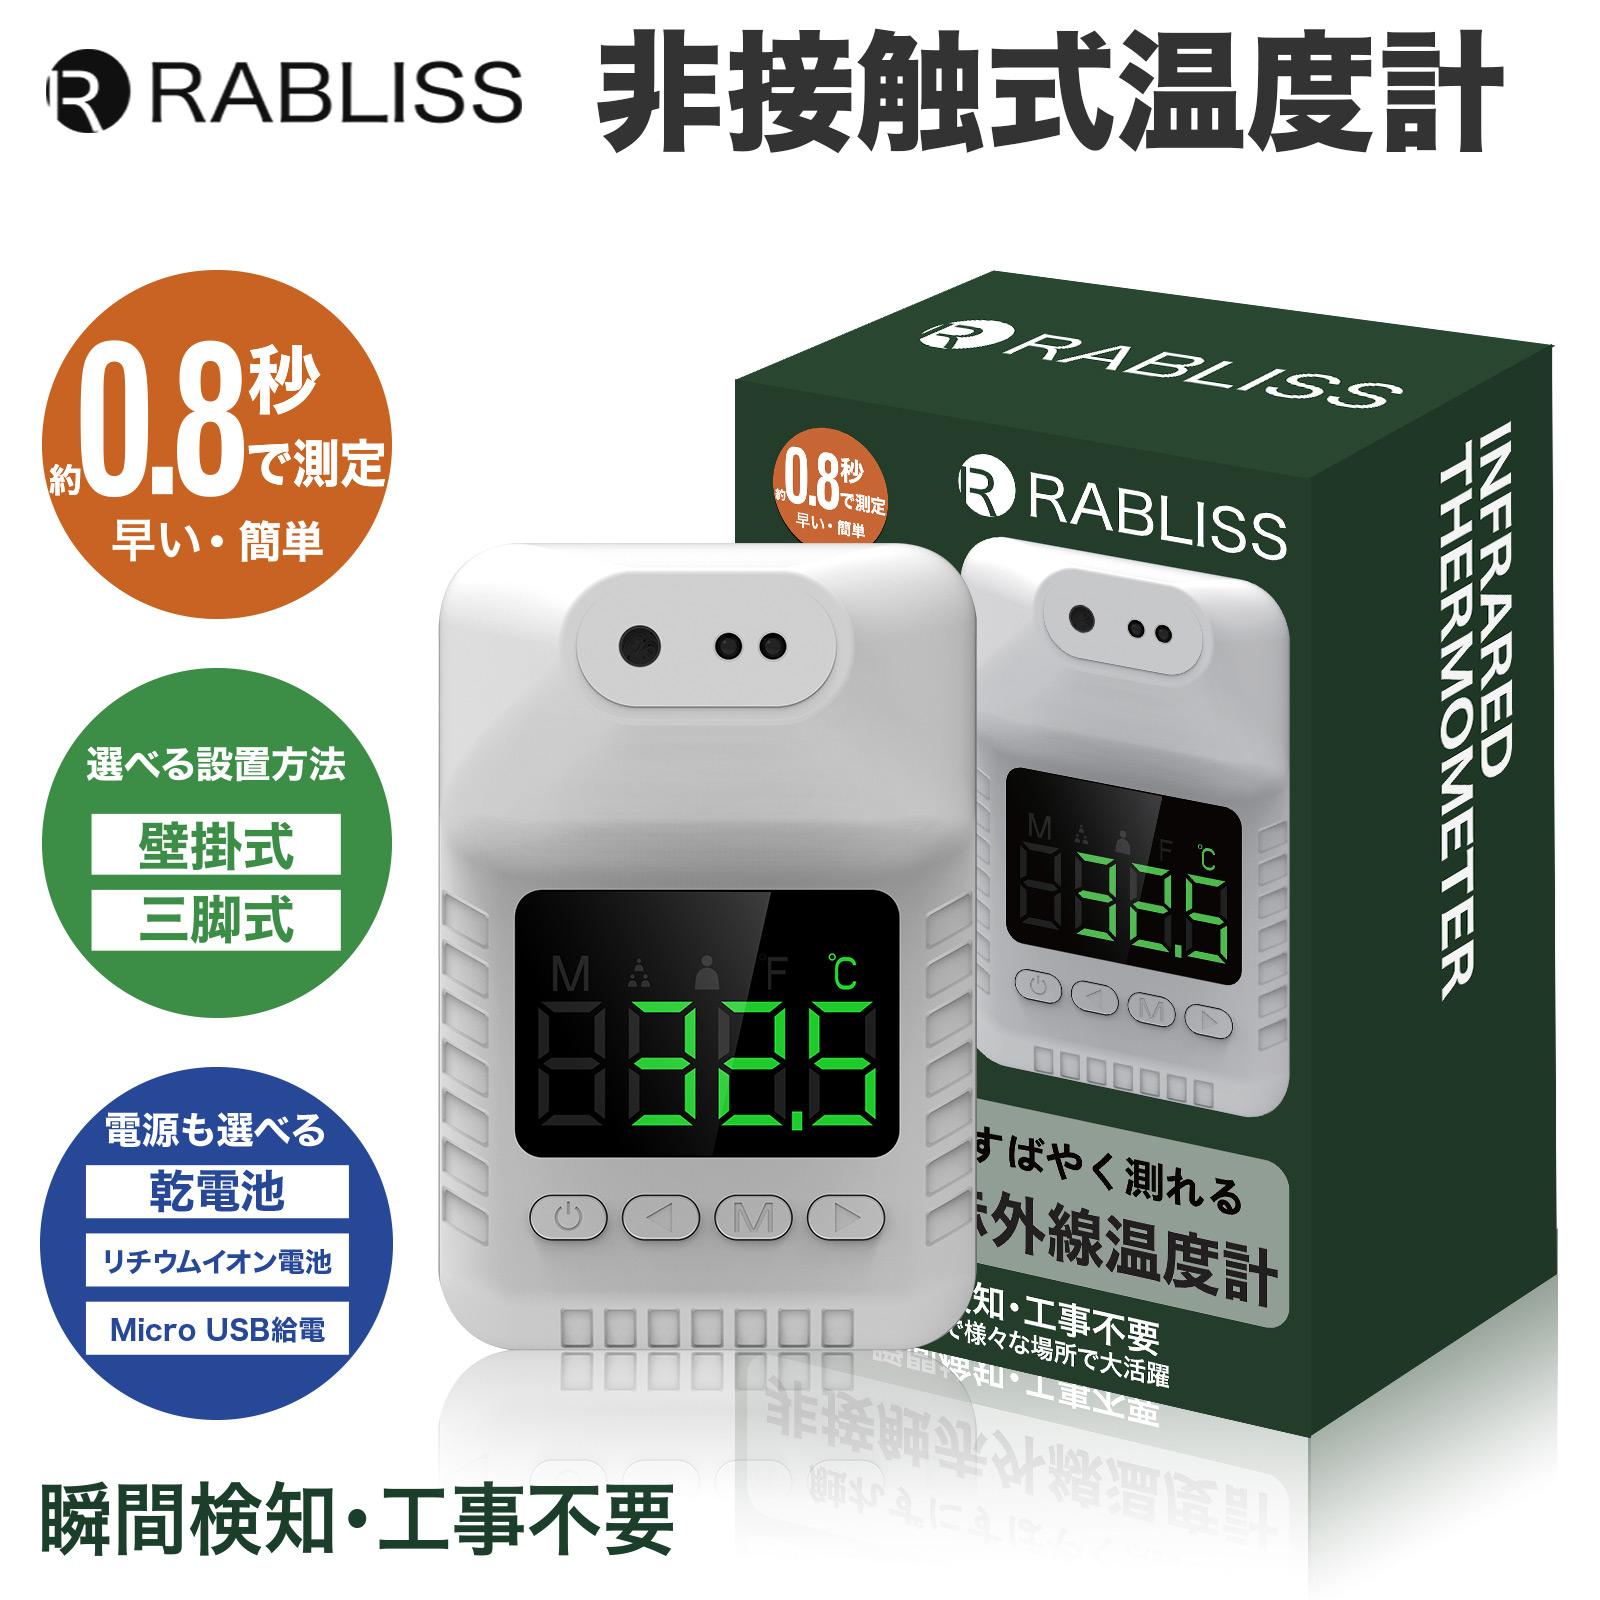 ★2021年最新★ 非接触式温度計 ノータッチ 自動温度測定器 壁掛け 三脚対応 両用 自動感応  センサー